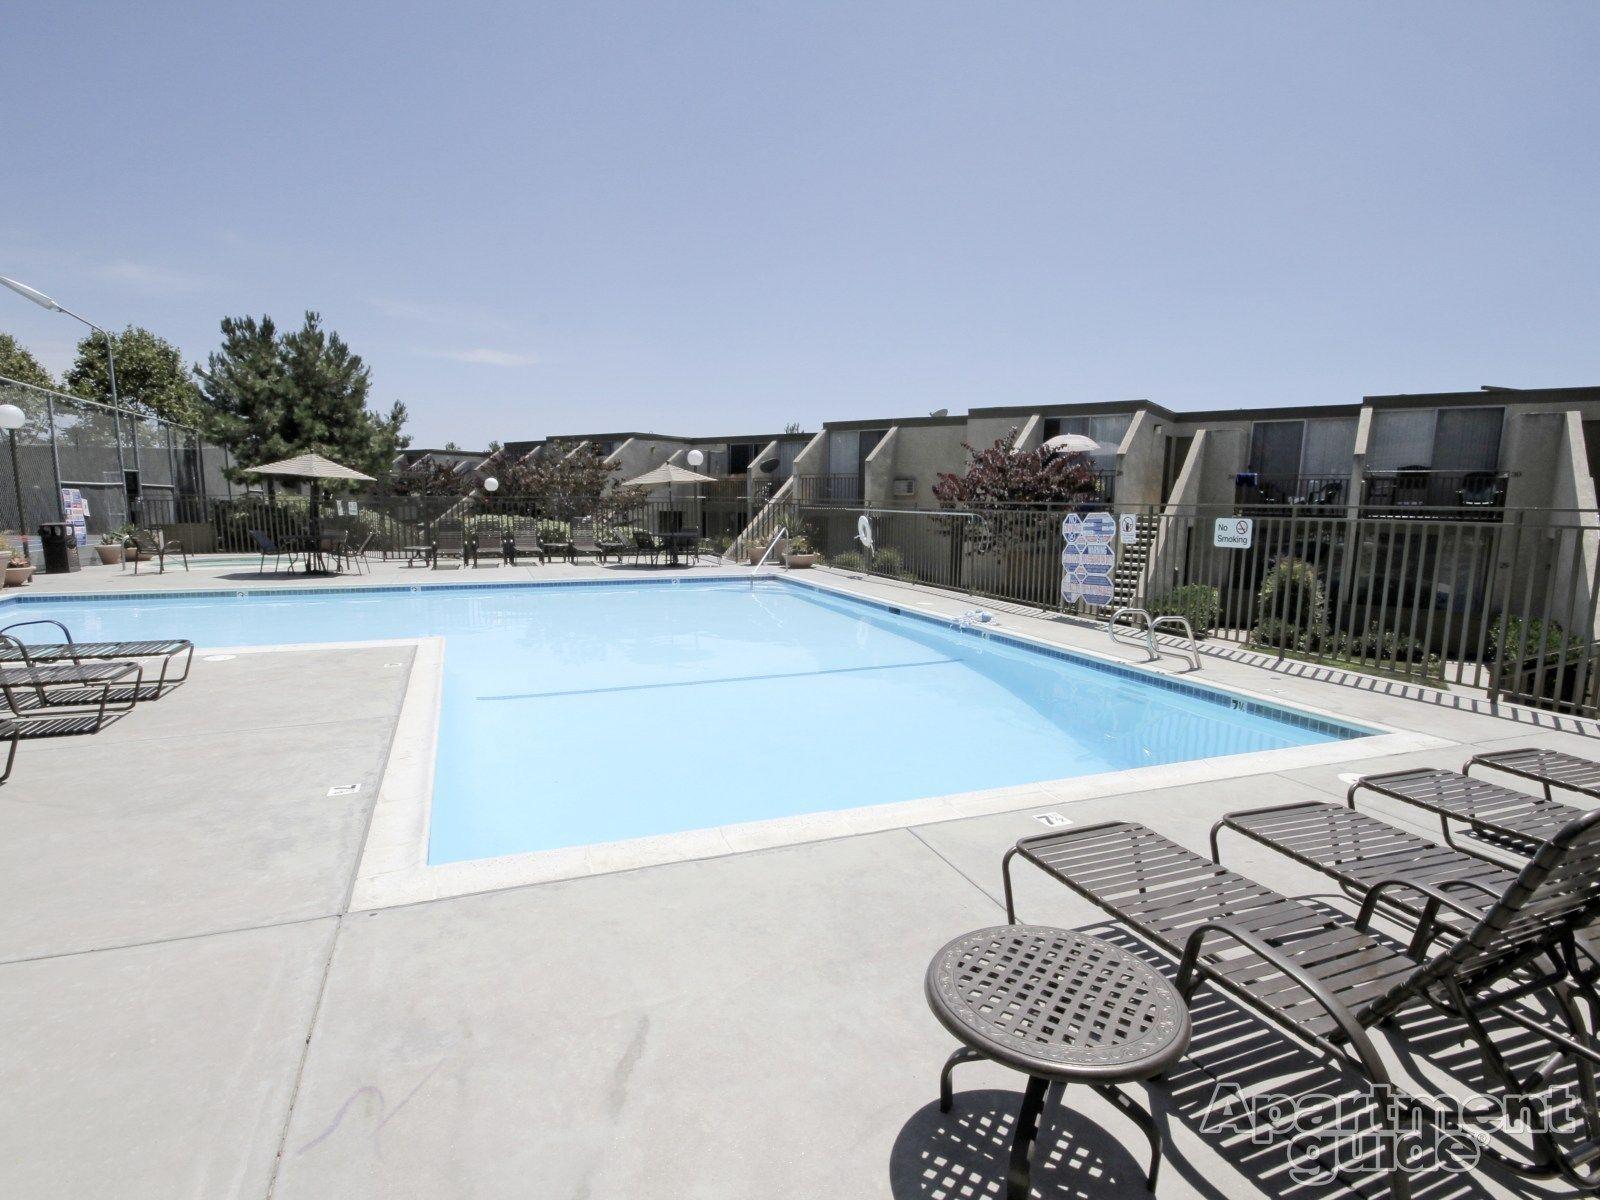 heatherwood garden apartments la mesa ca 91942 apartments for